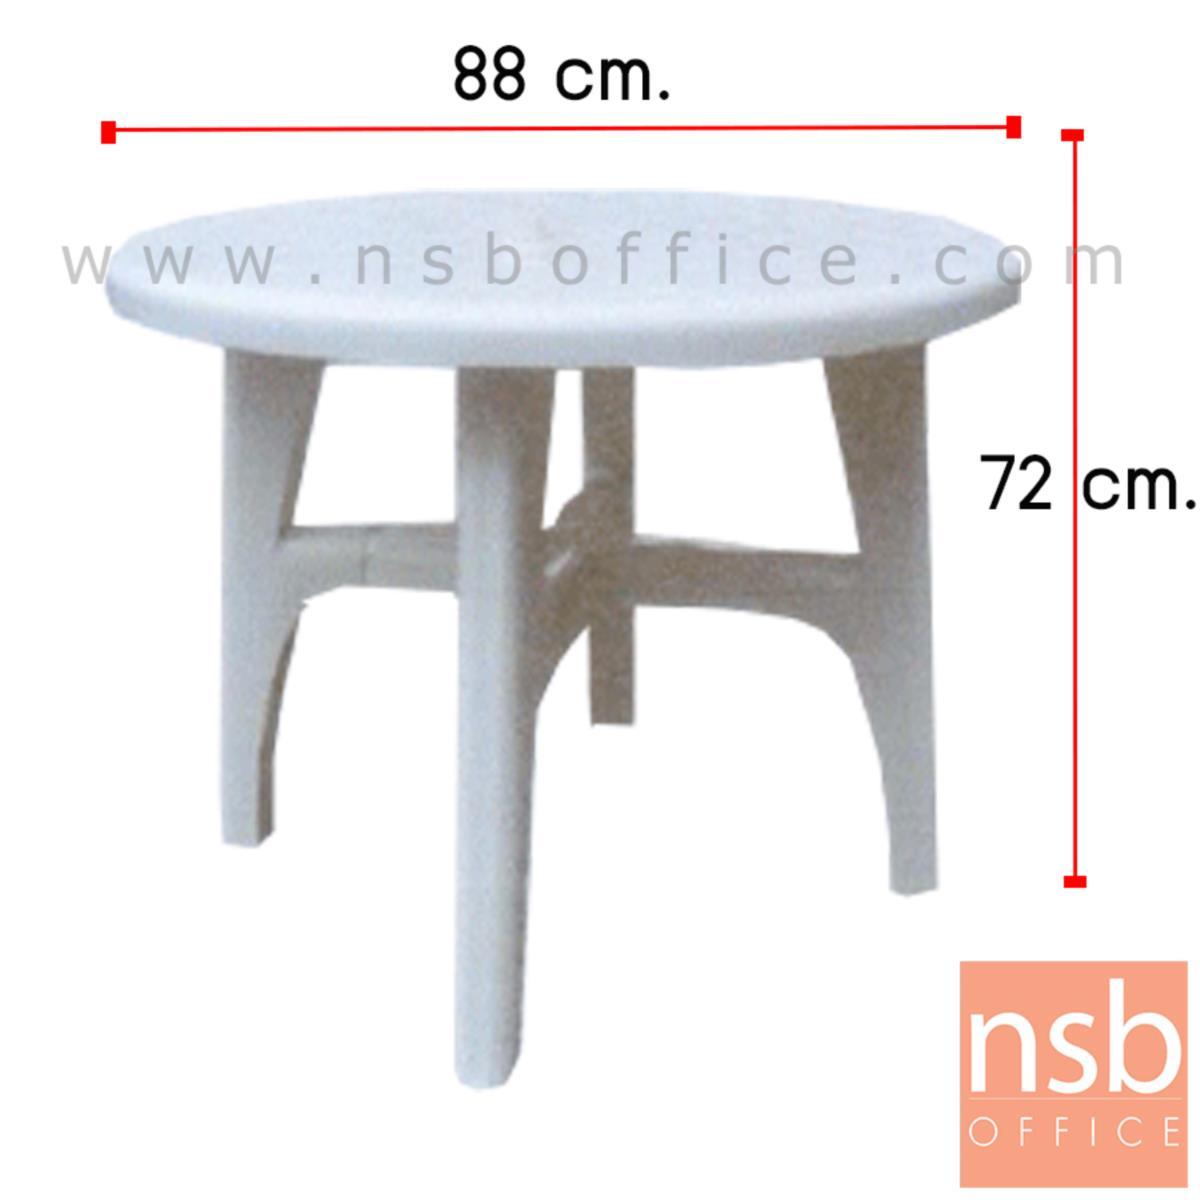 A08A013:โต๊ะหน้าพลาสติก รุ่น TOTO-ROUND  ขนาด 88W cm.  ขาพลาสติก